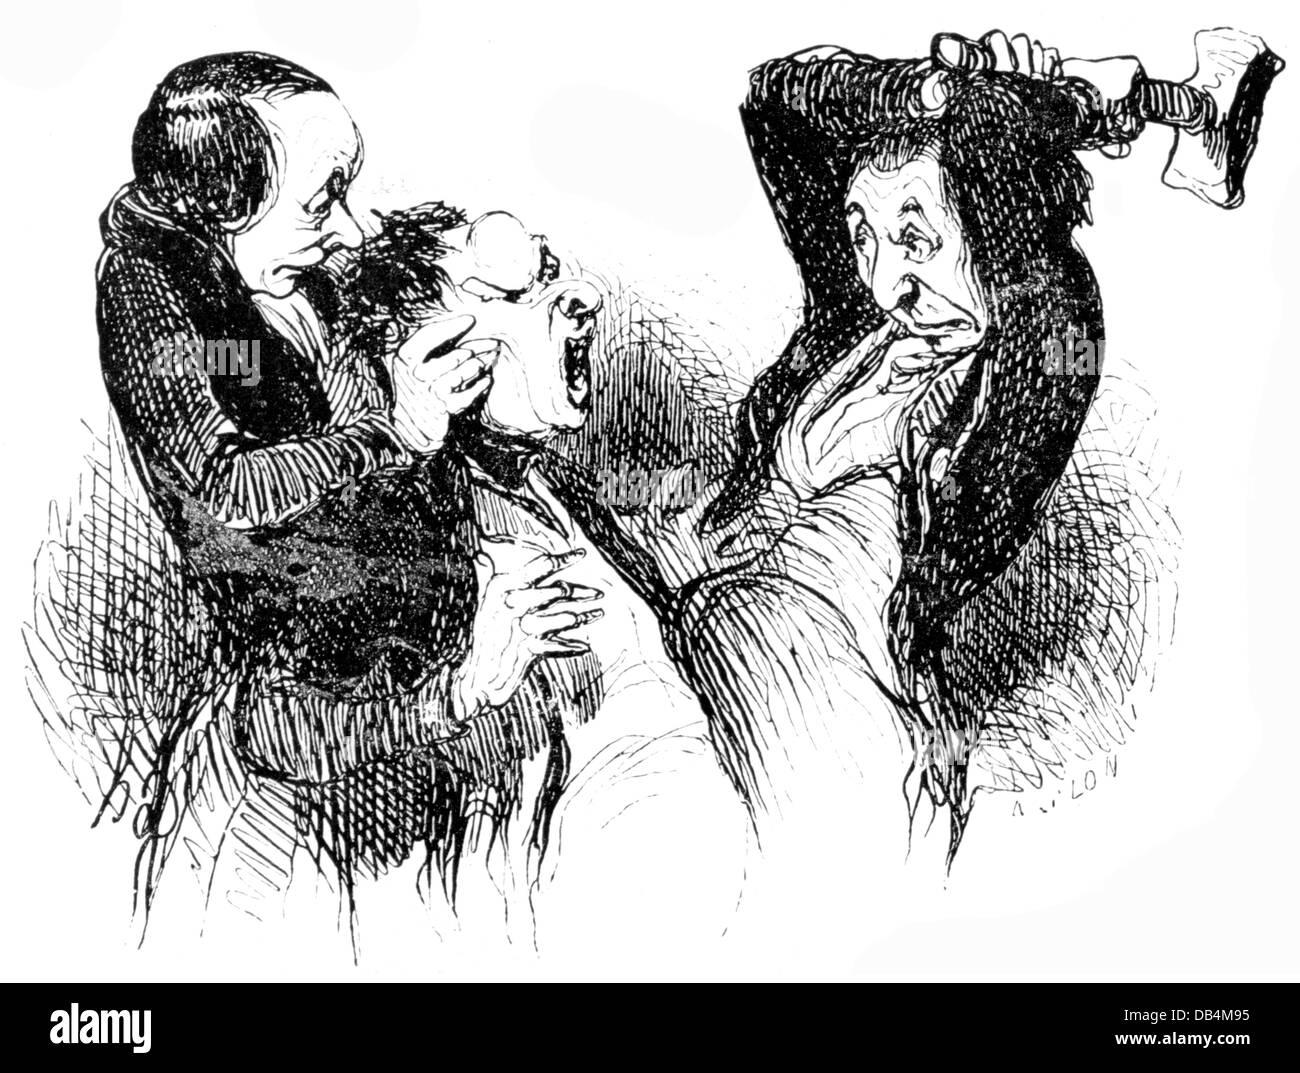 medicine, homeopathy / allopathy, 'Simile simili, c'est la loi de nature' (Simile simili, that's - Stock Image